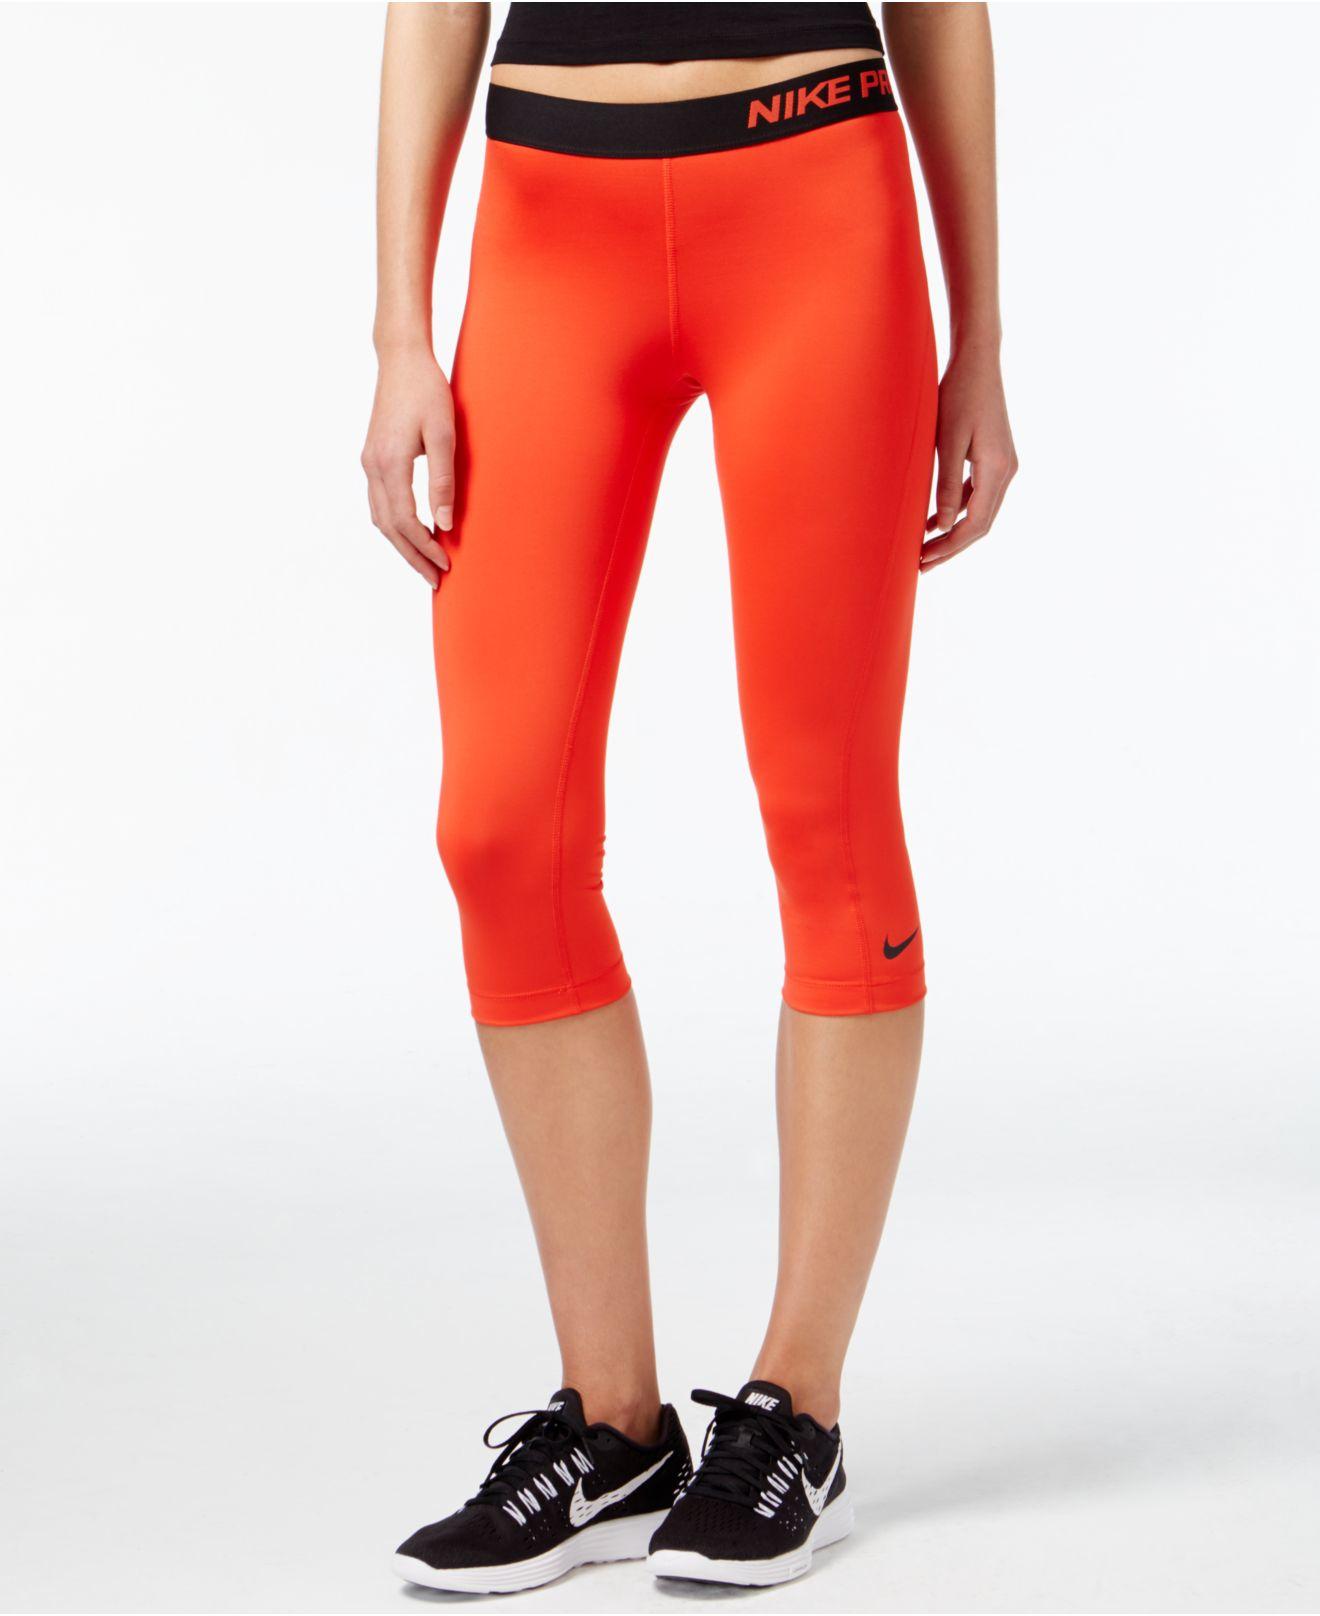 Lyst - Nike Pro Capri Active Leggings in Red ae93d1da1